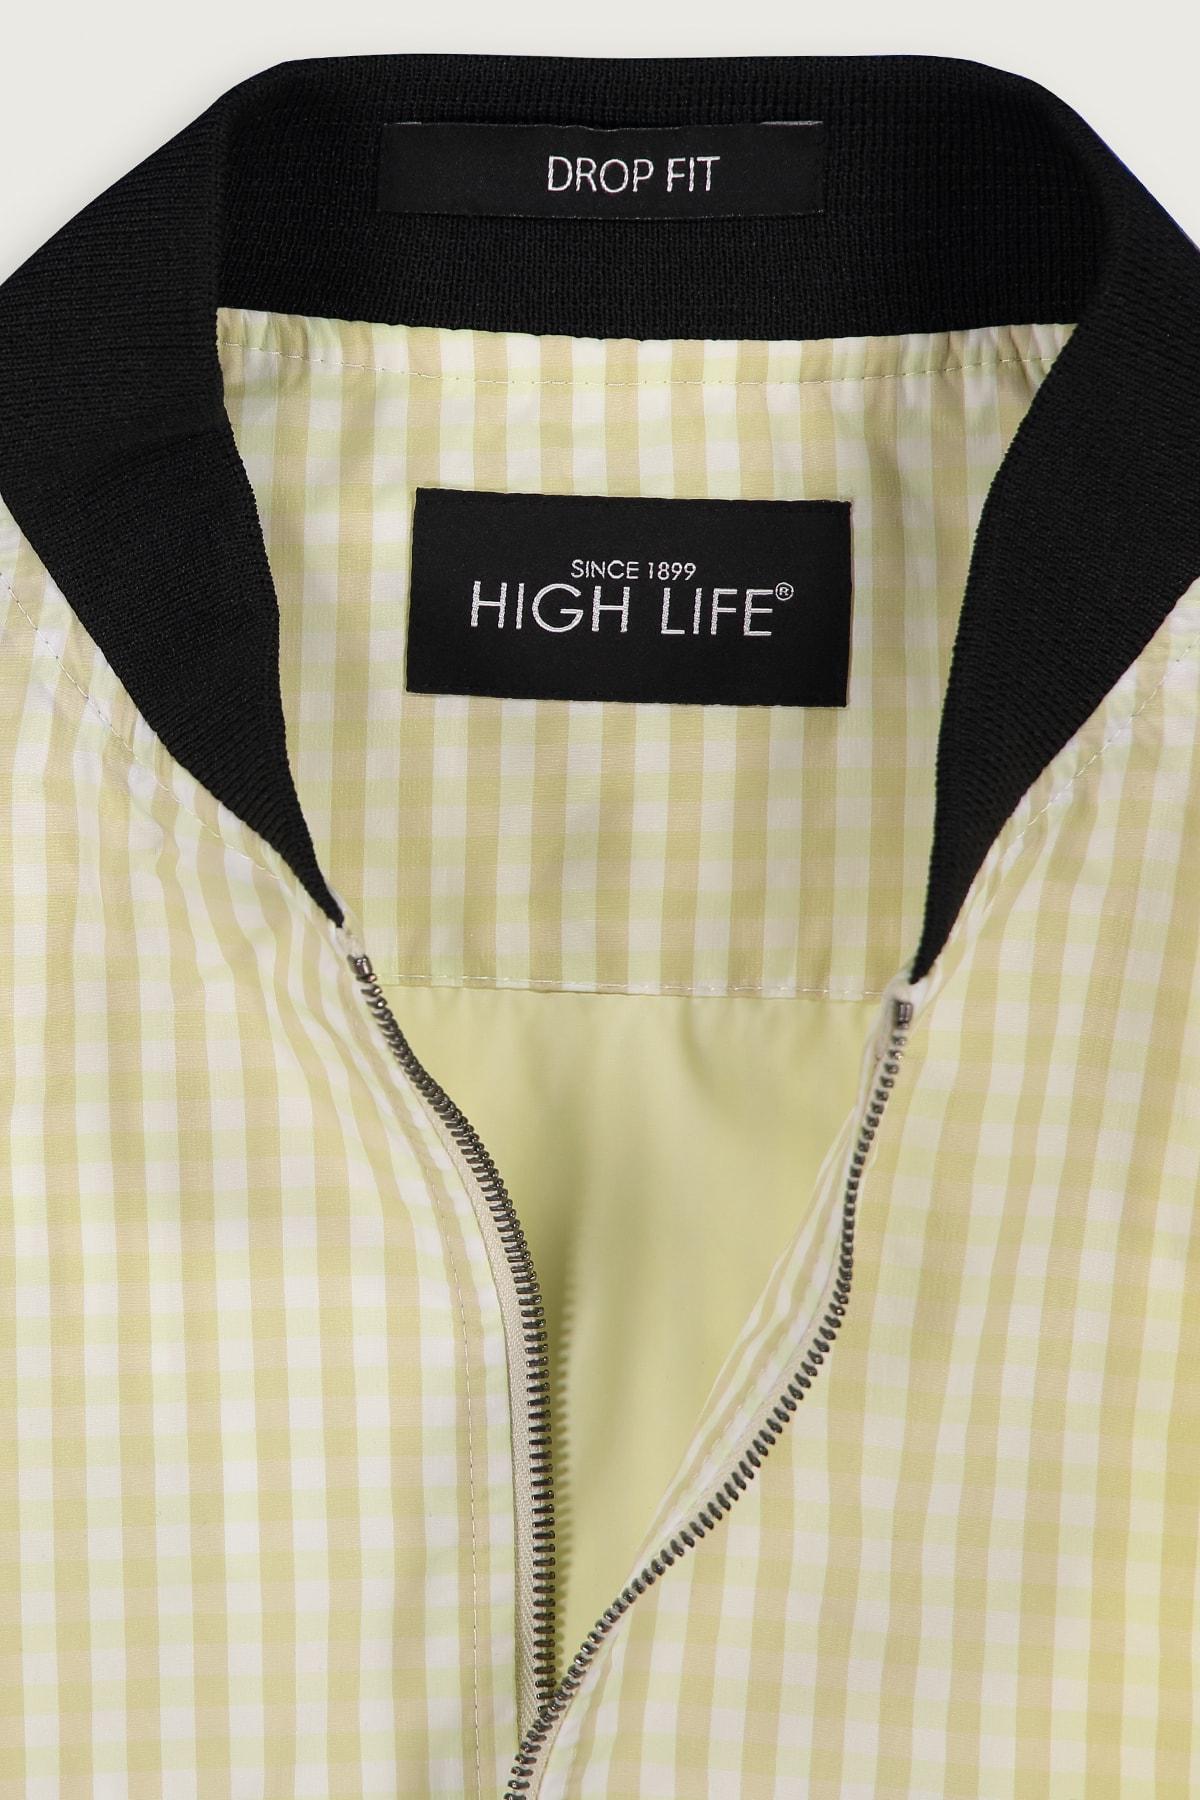 Chamarra High Life corte Slim, amarilla con Rayas a contraste.